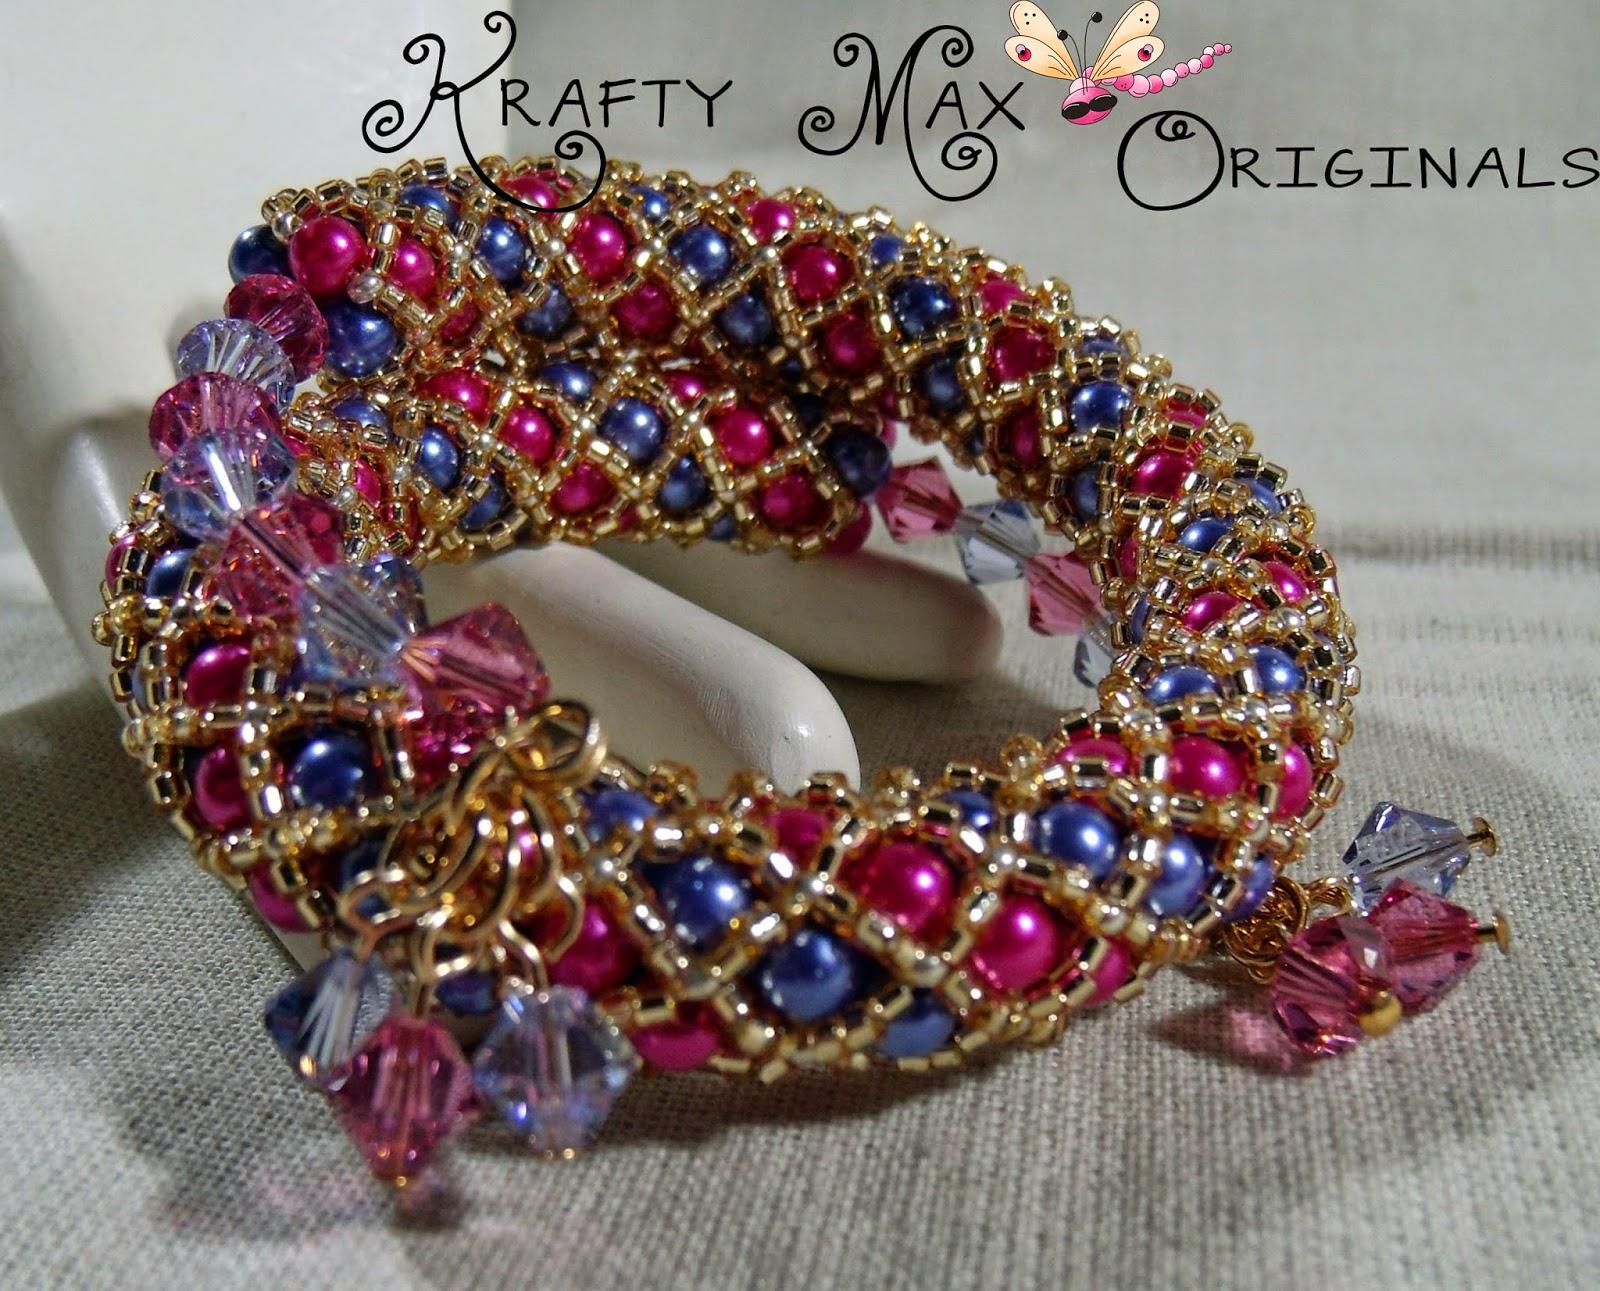 http://www.artfire.com/ext/shop/product_view/9376724